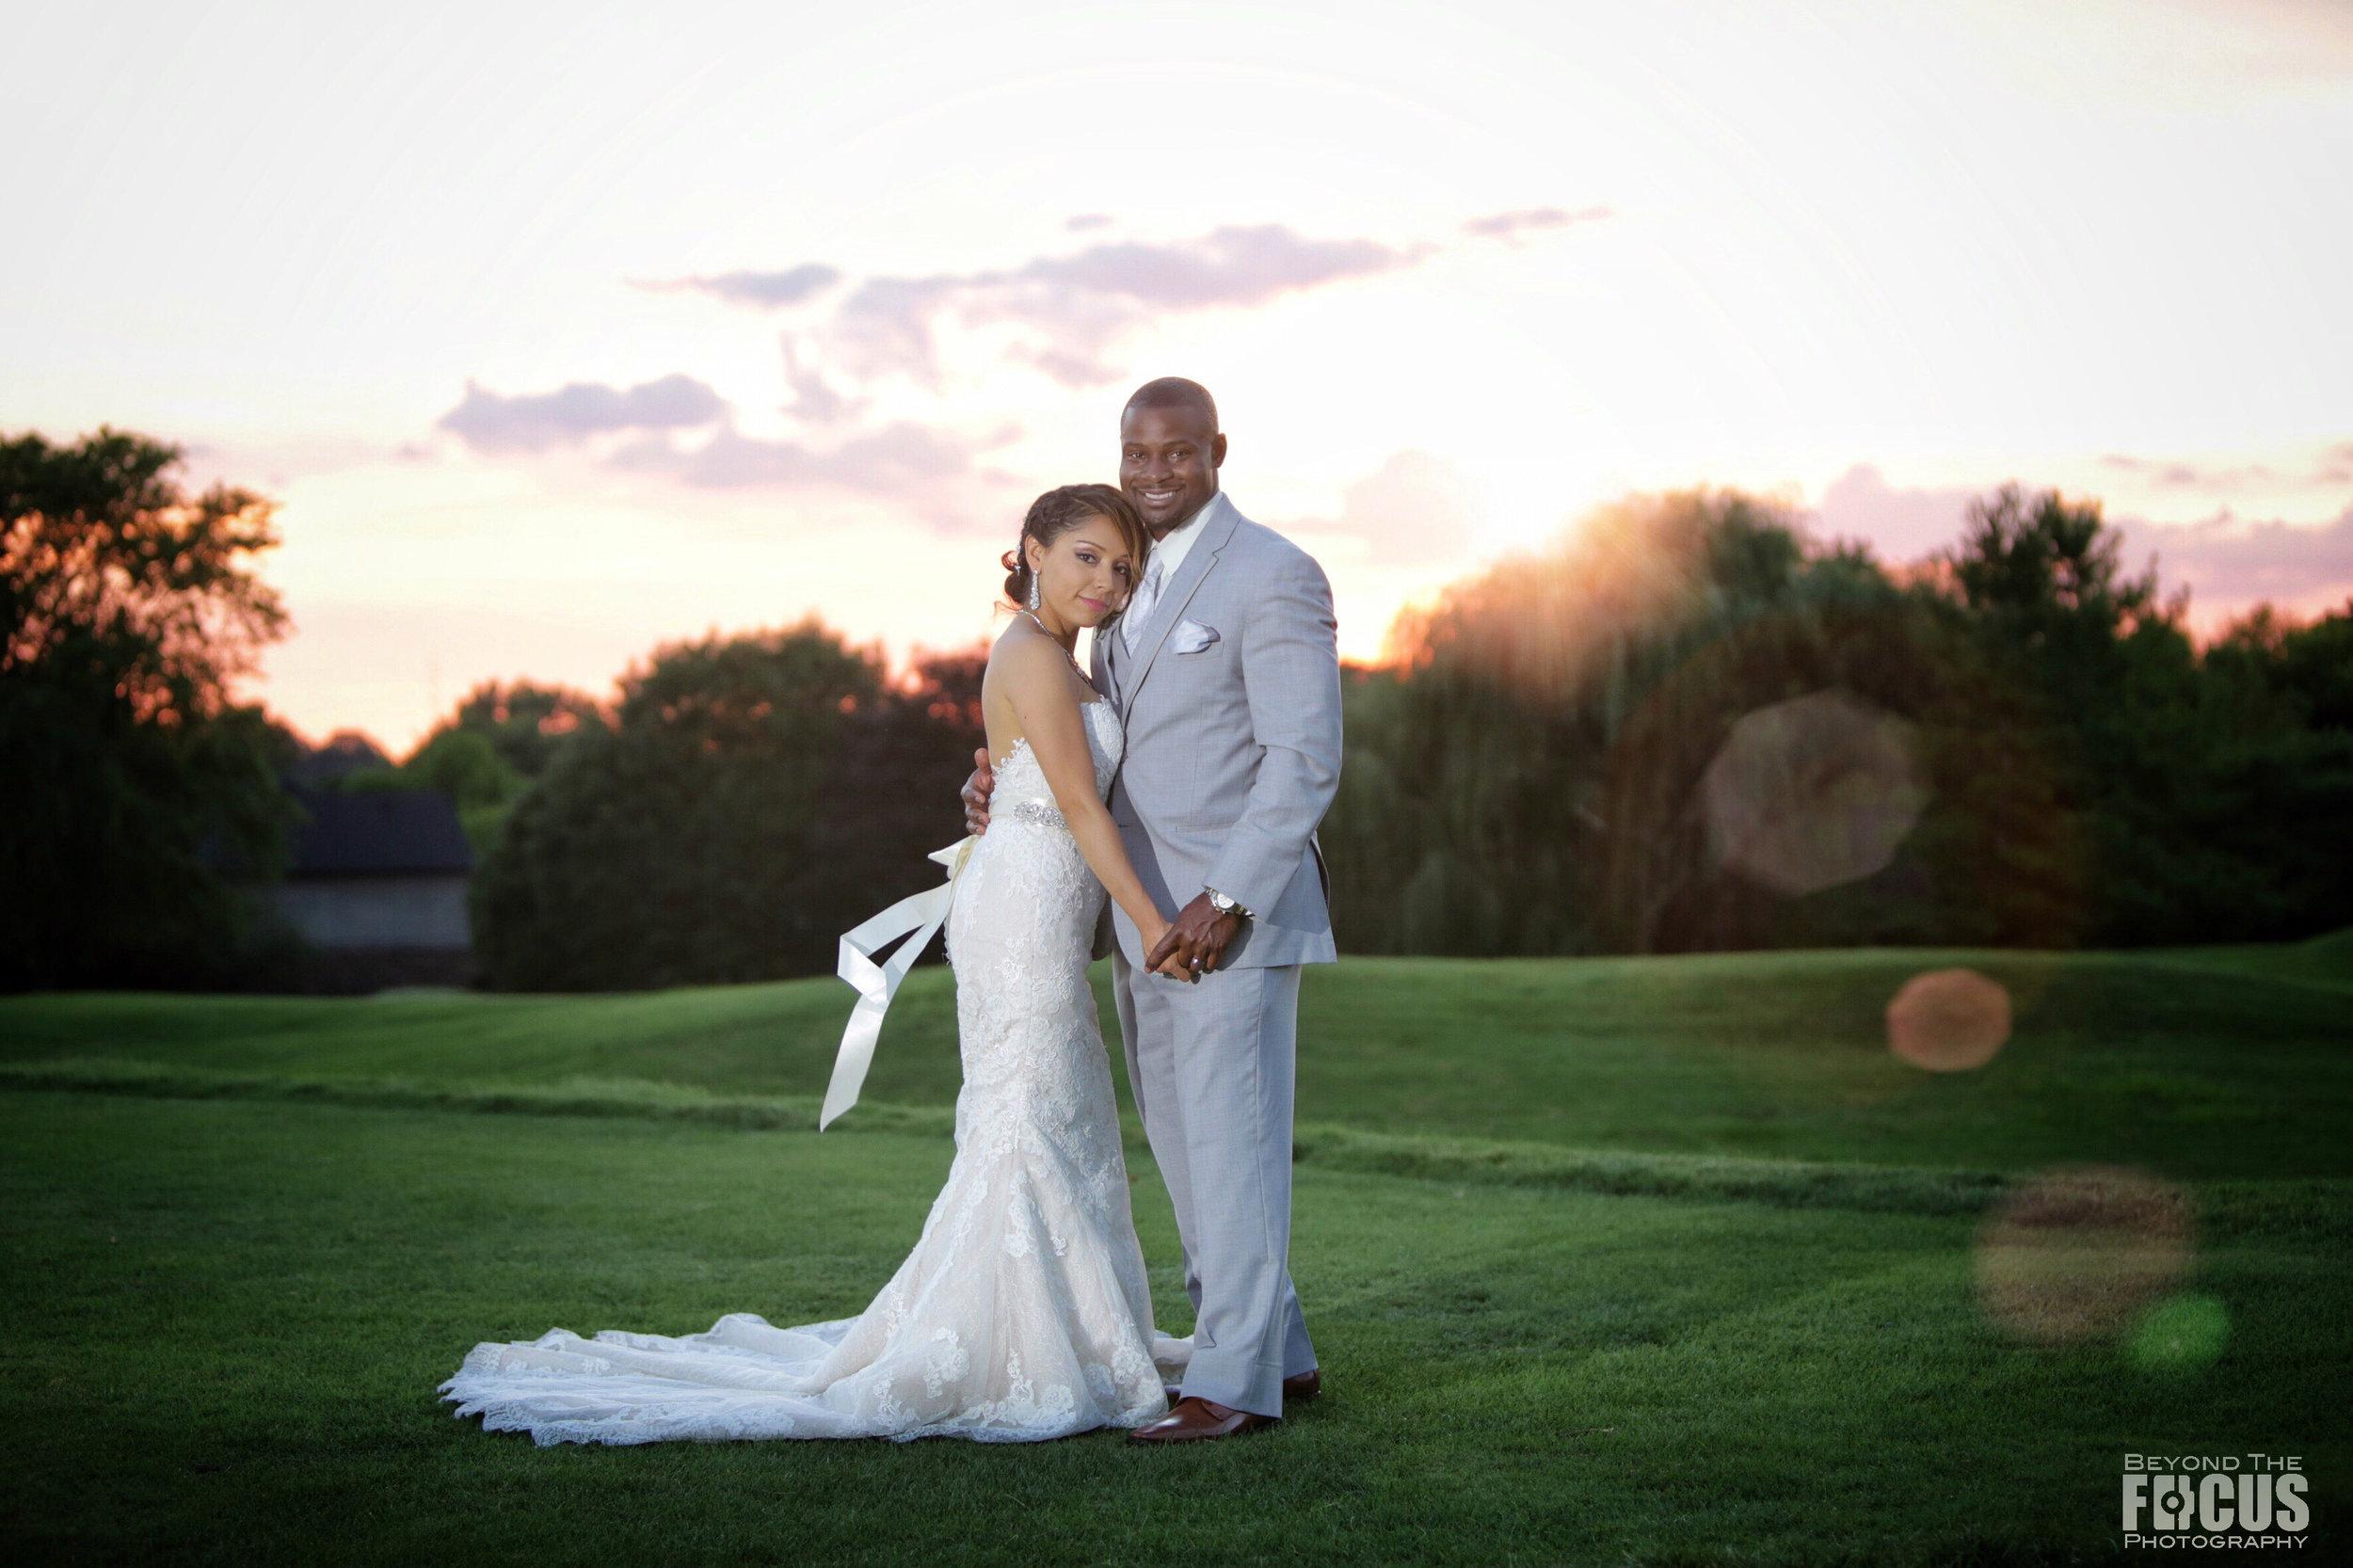 Palmer Wedding - Bride& Groom Post Wedding 21.jpg